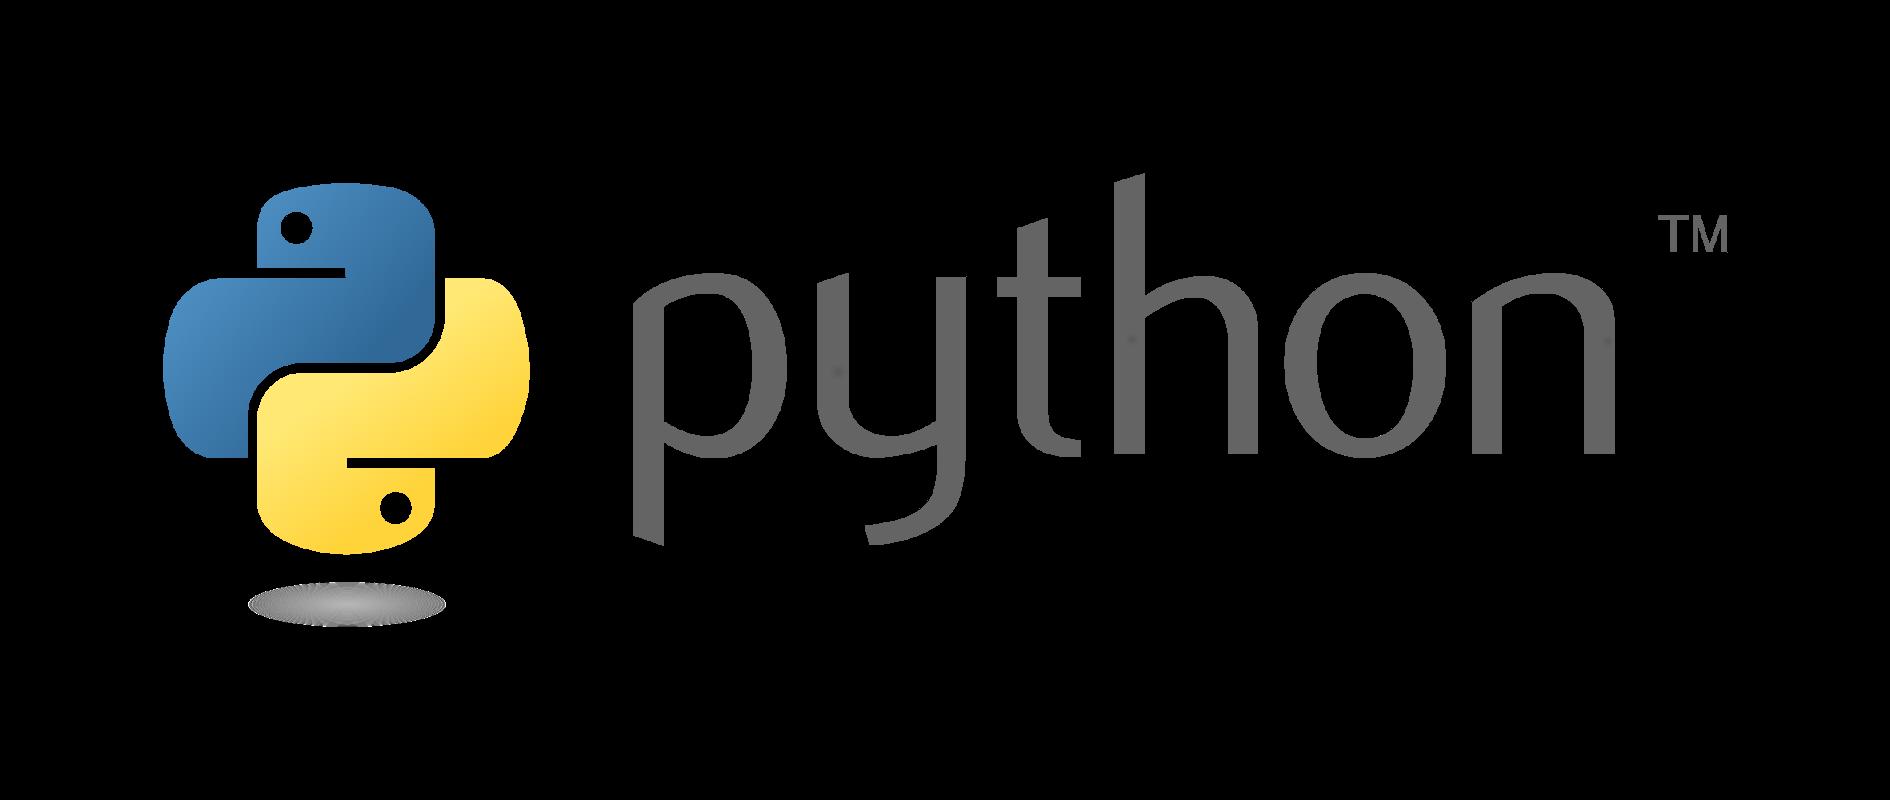 [Programming] Пишем программу на Python. Урок 1.